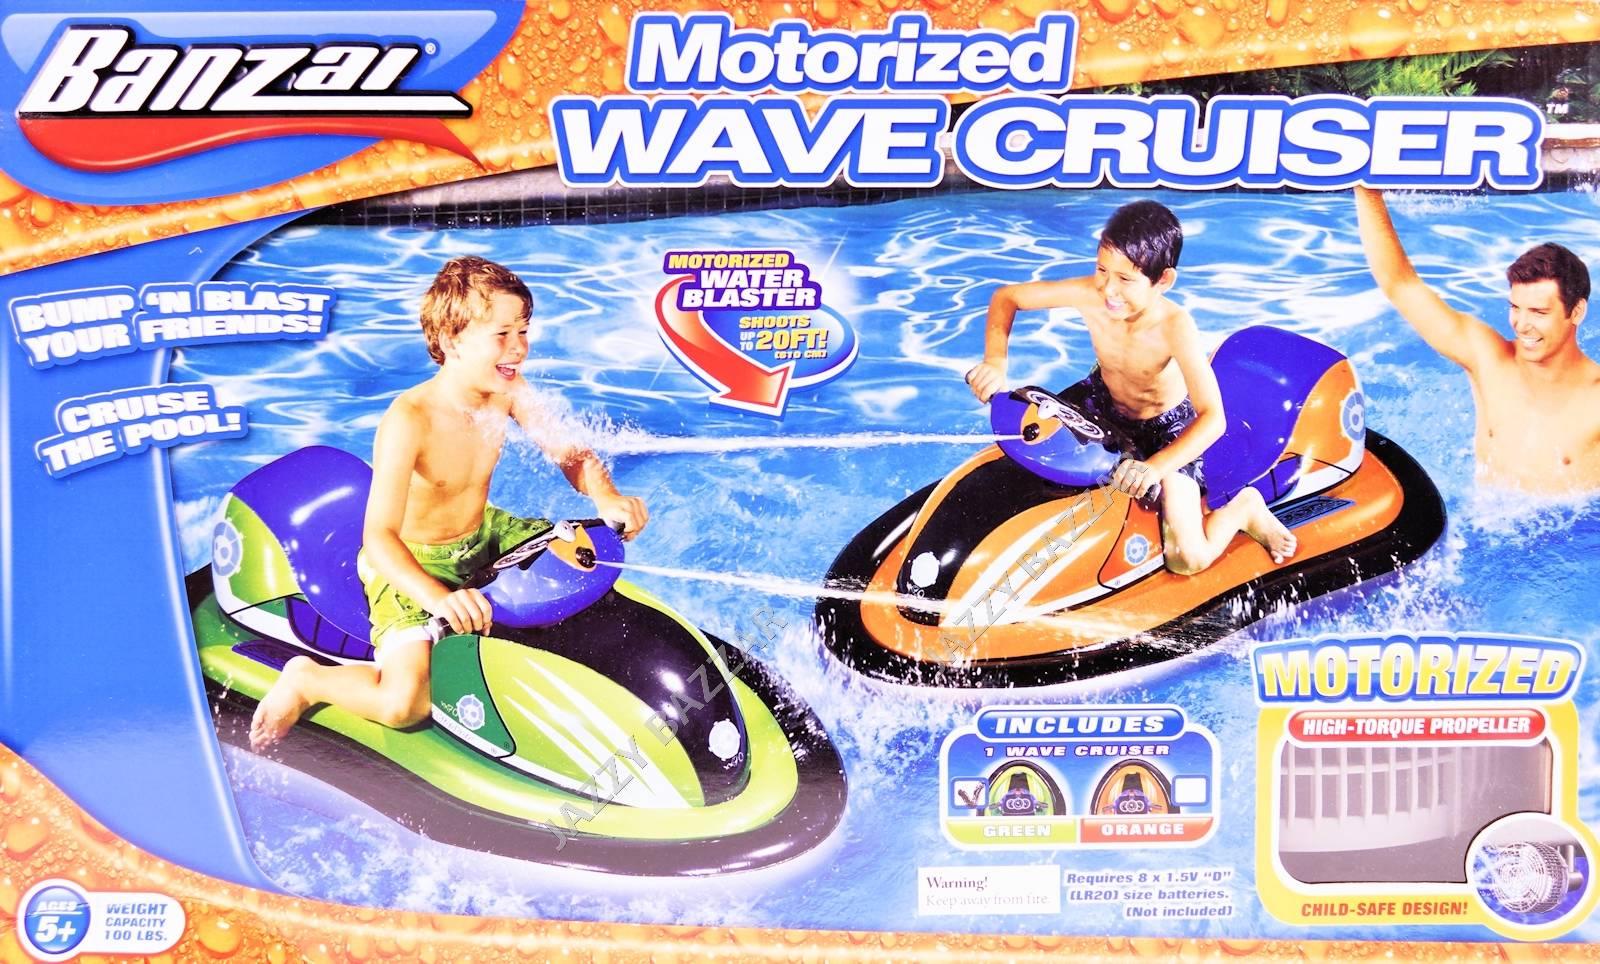 Banzai Motorised Wave Cruiser Inflatable Kids Jet Ski Pool